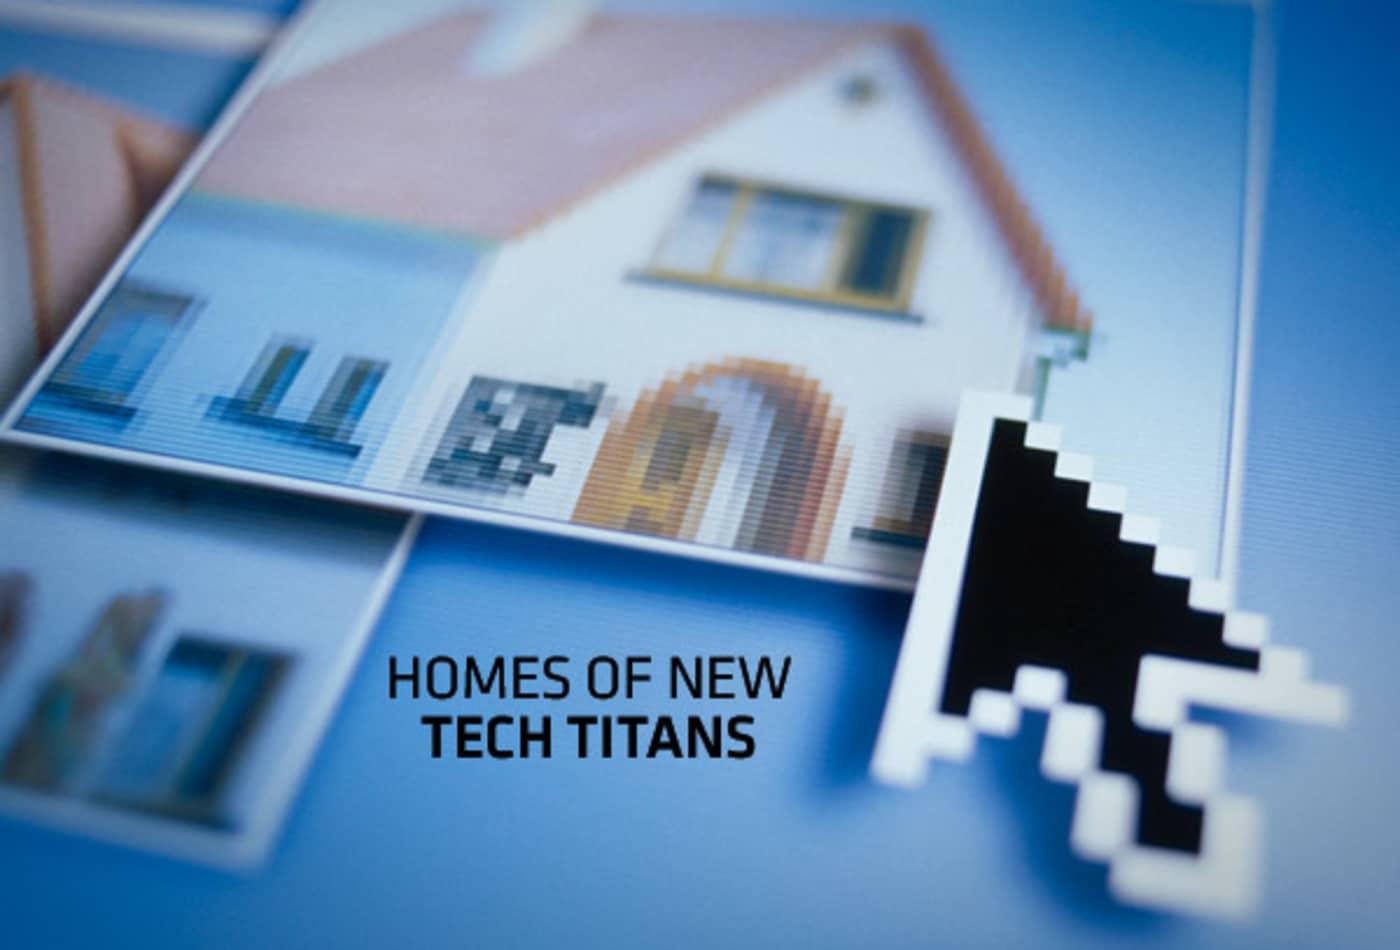 homes-of-tech-titans-cover1.jpg